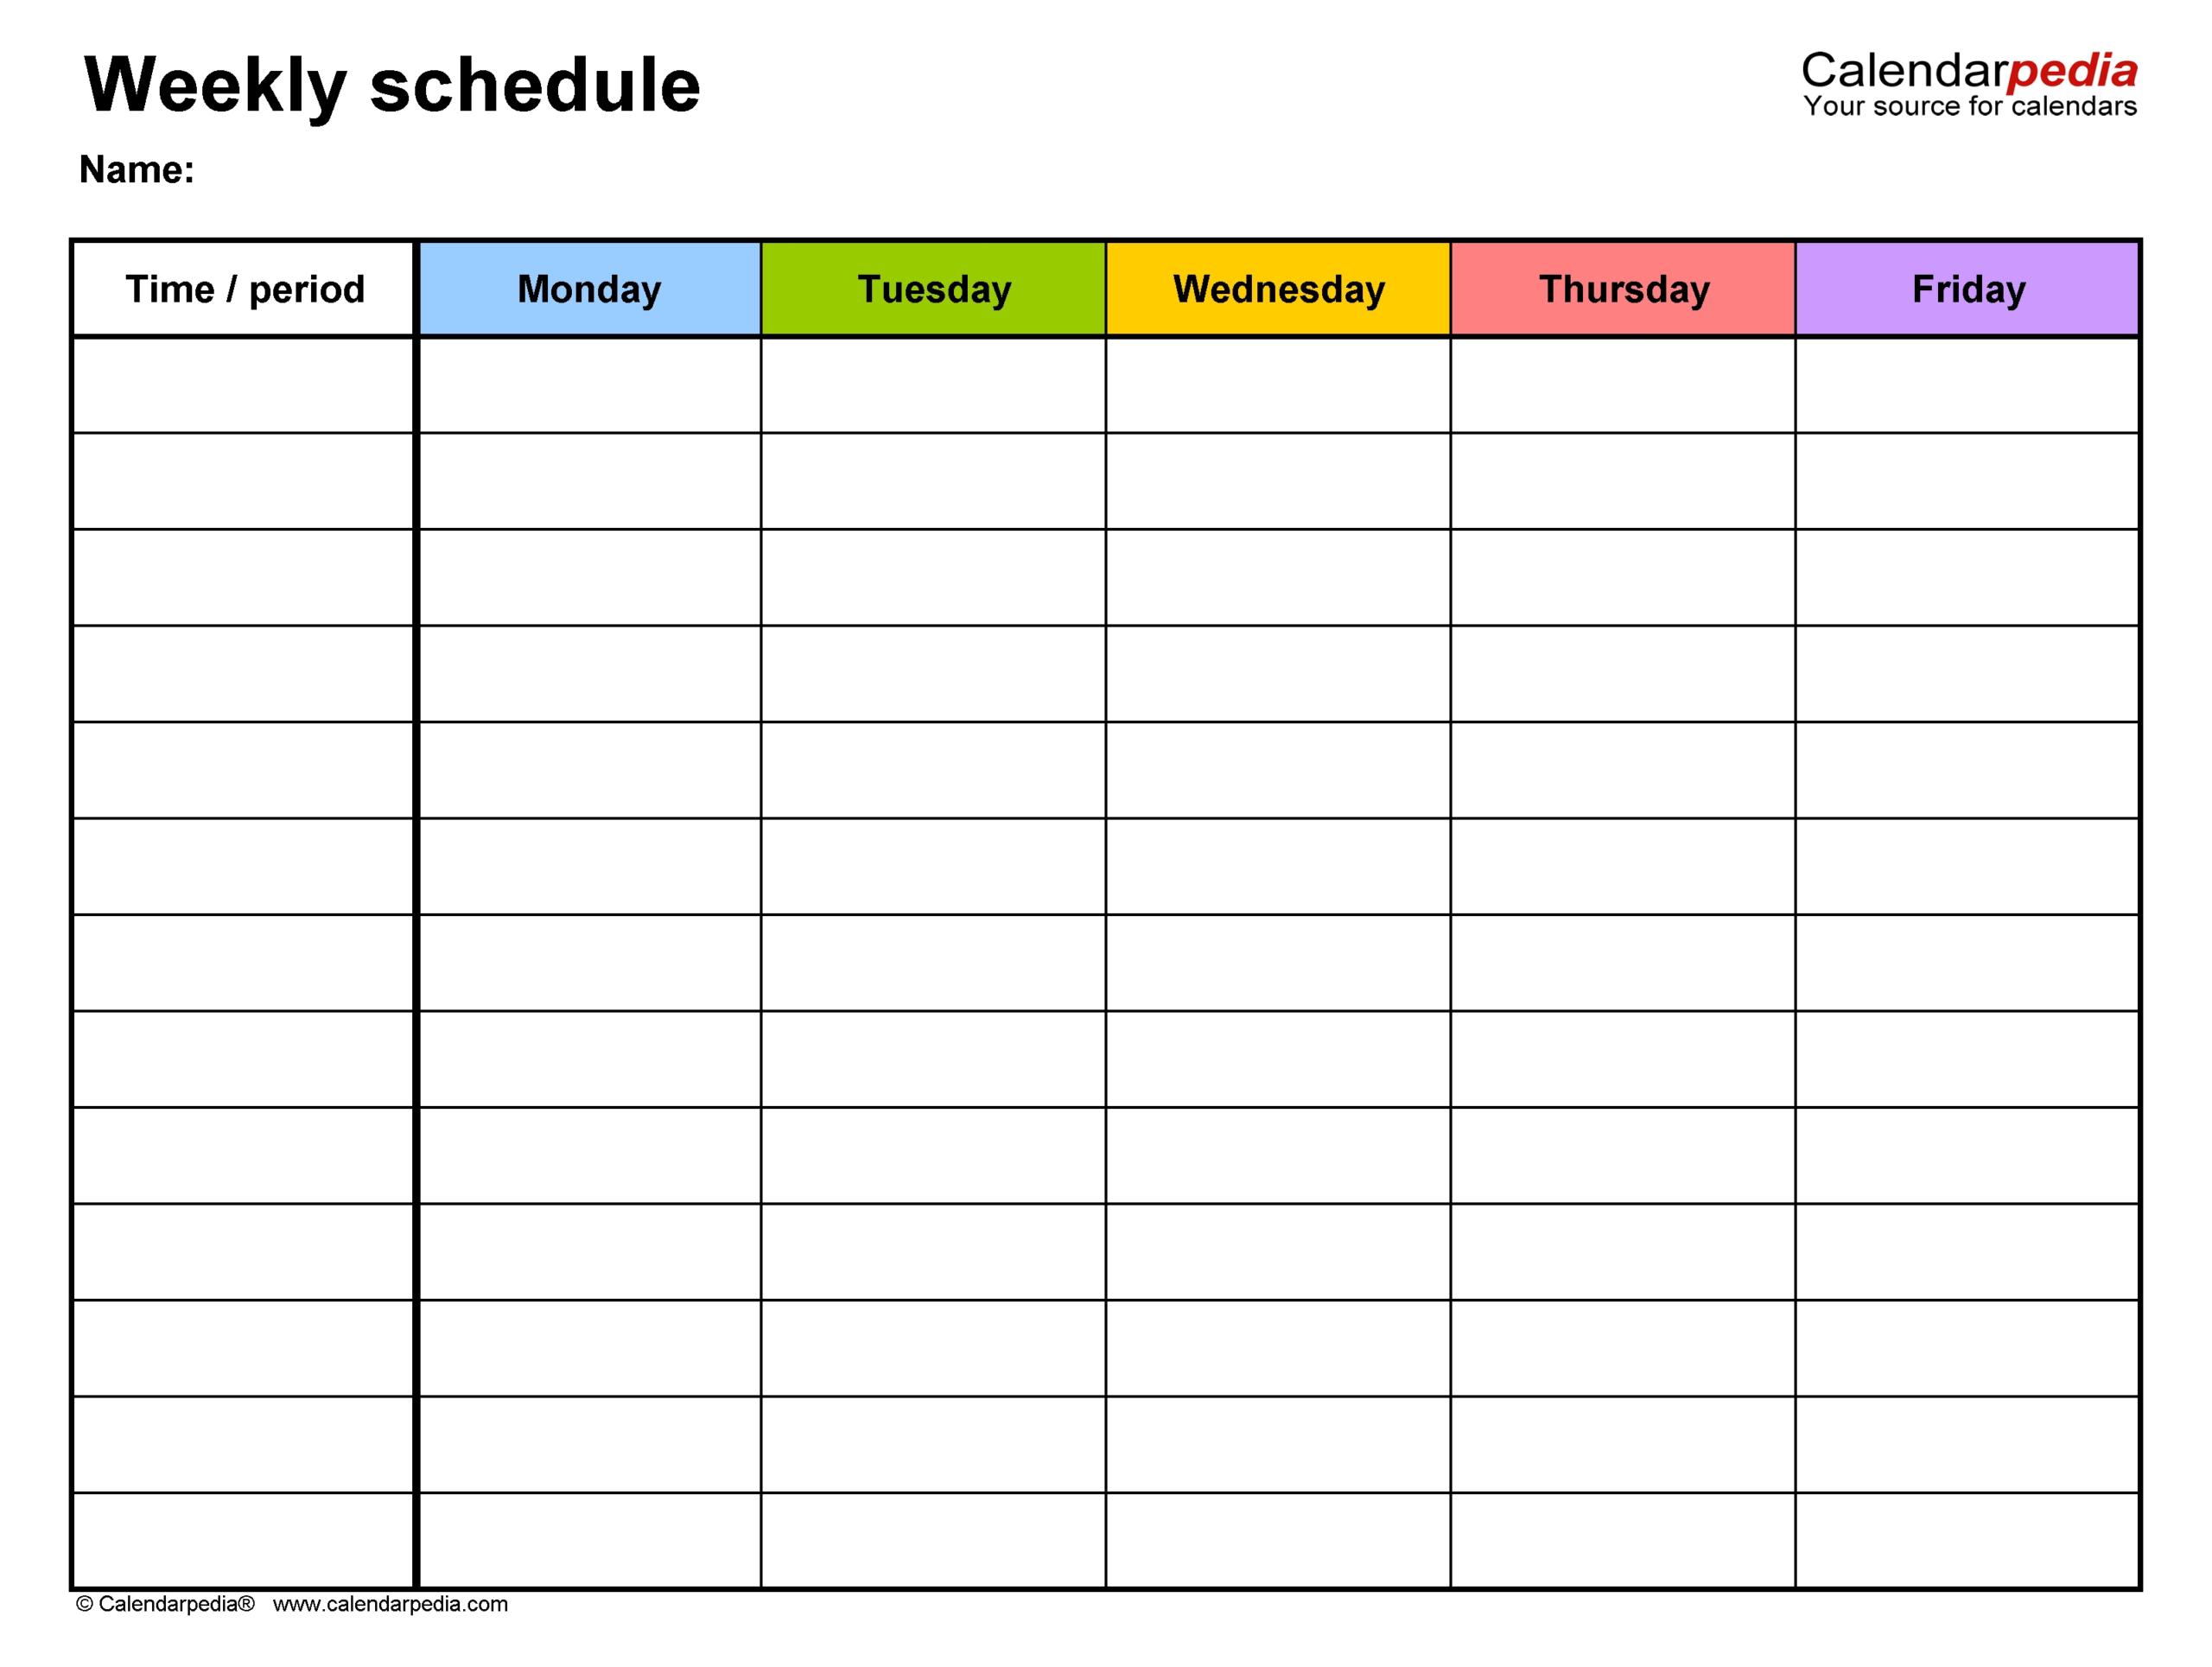 5 Day Week Calender Template | Calendar Template Printable within Blank Calendar 5 Day Week